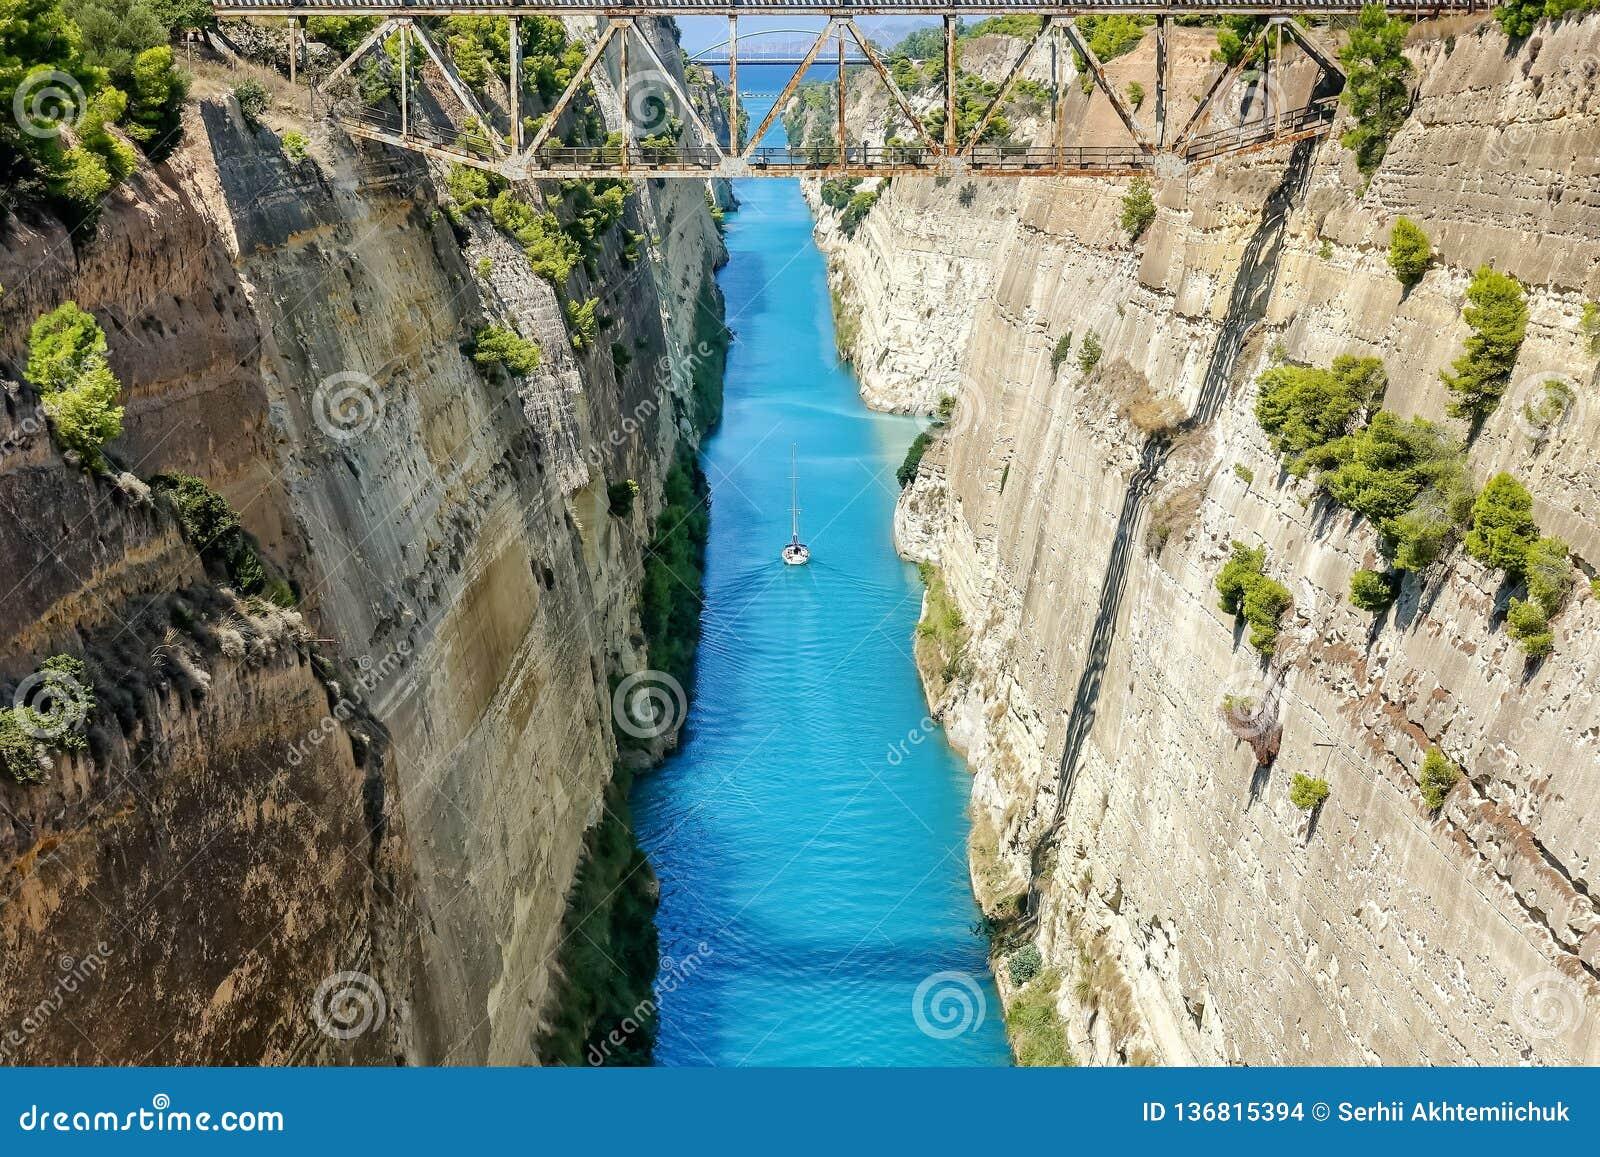 Corinth kanal i Grekland i en sommardag